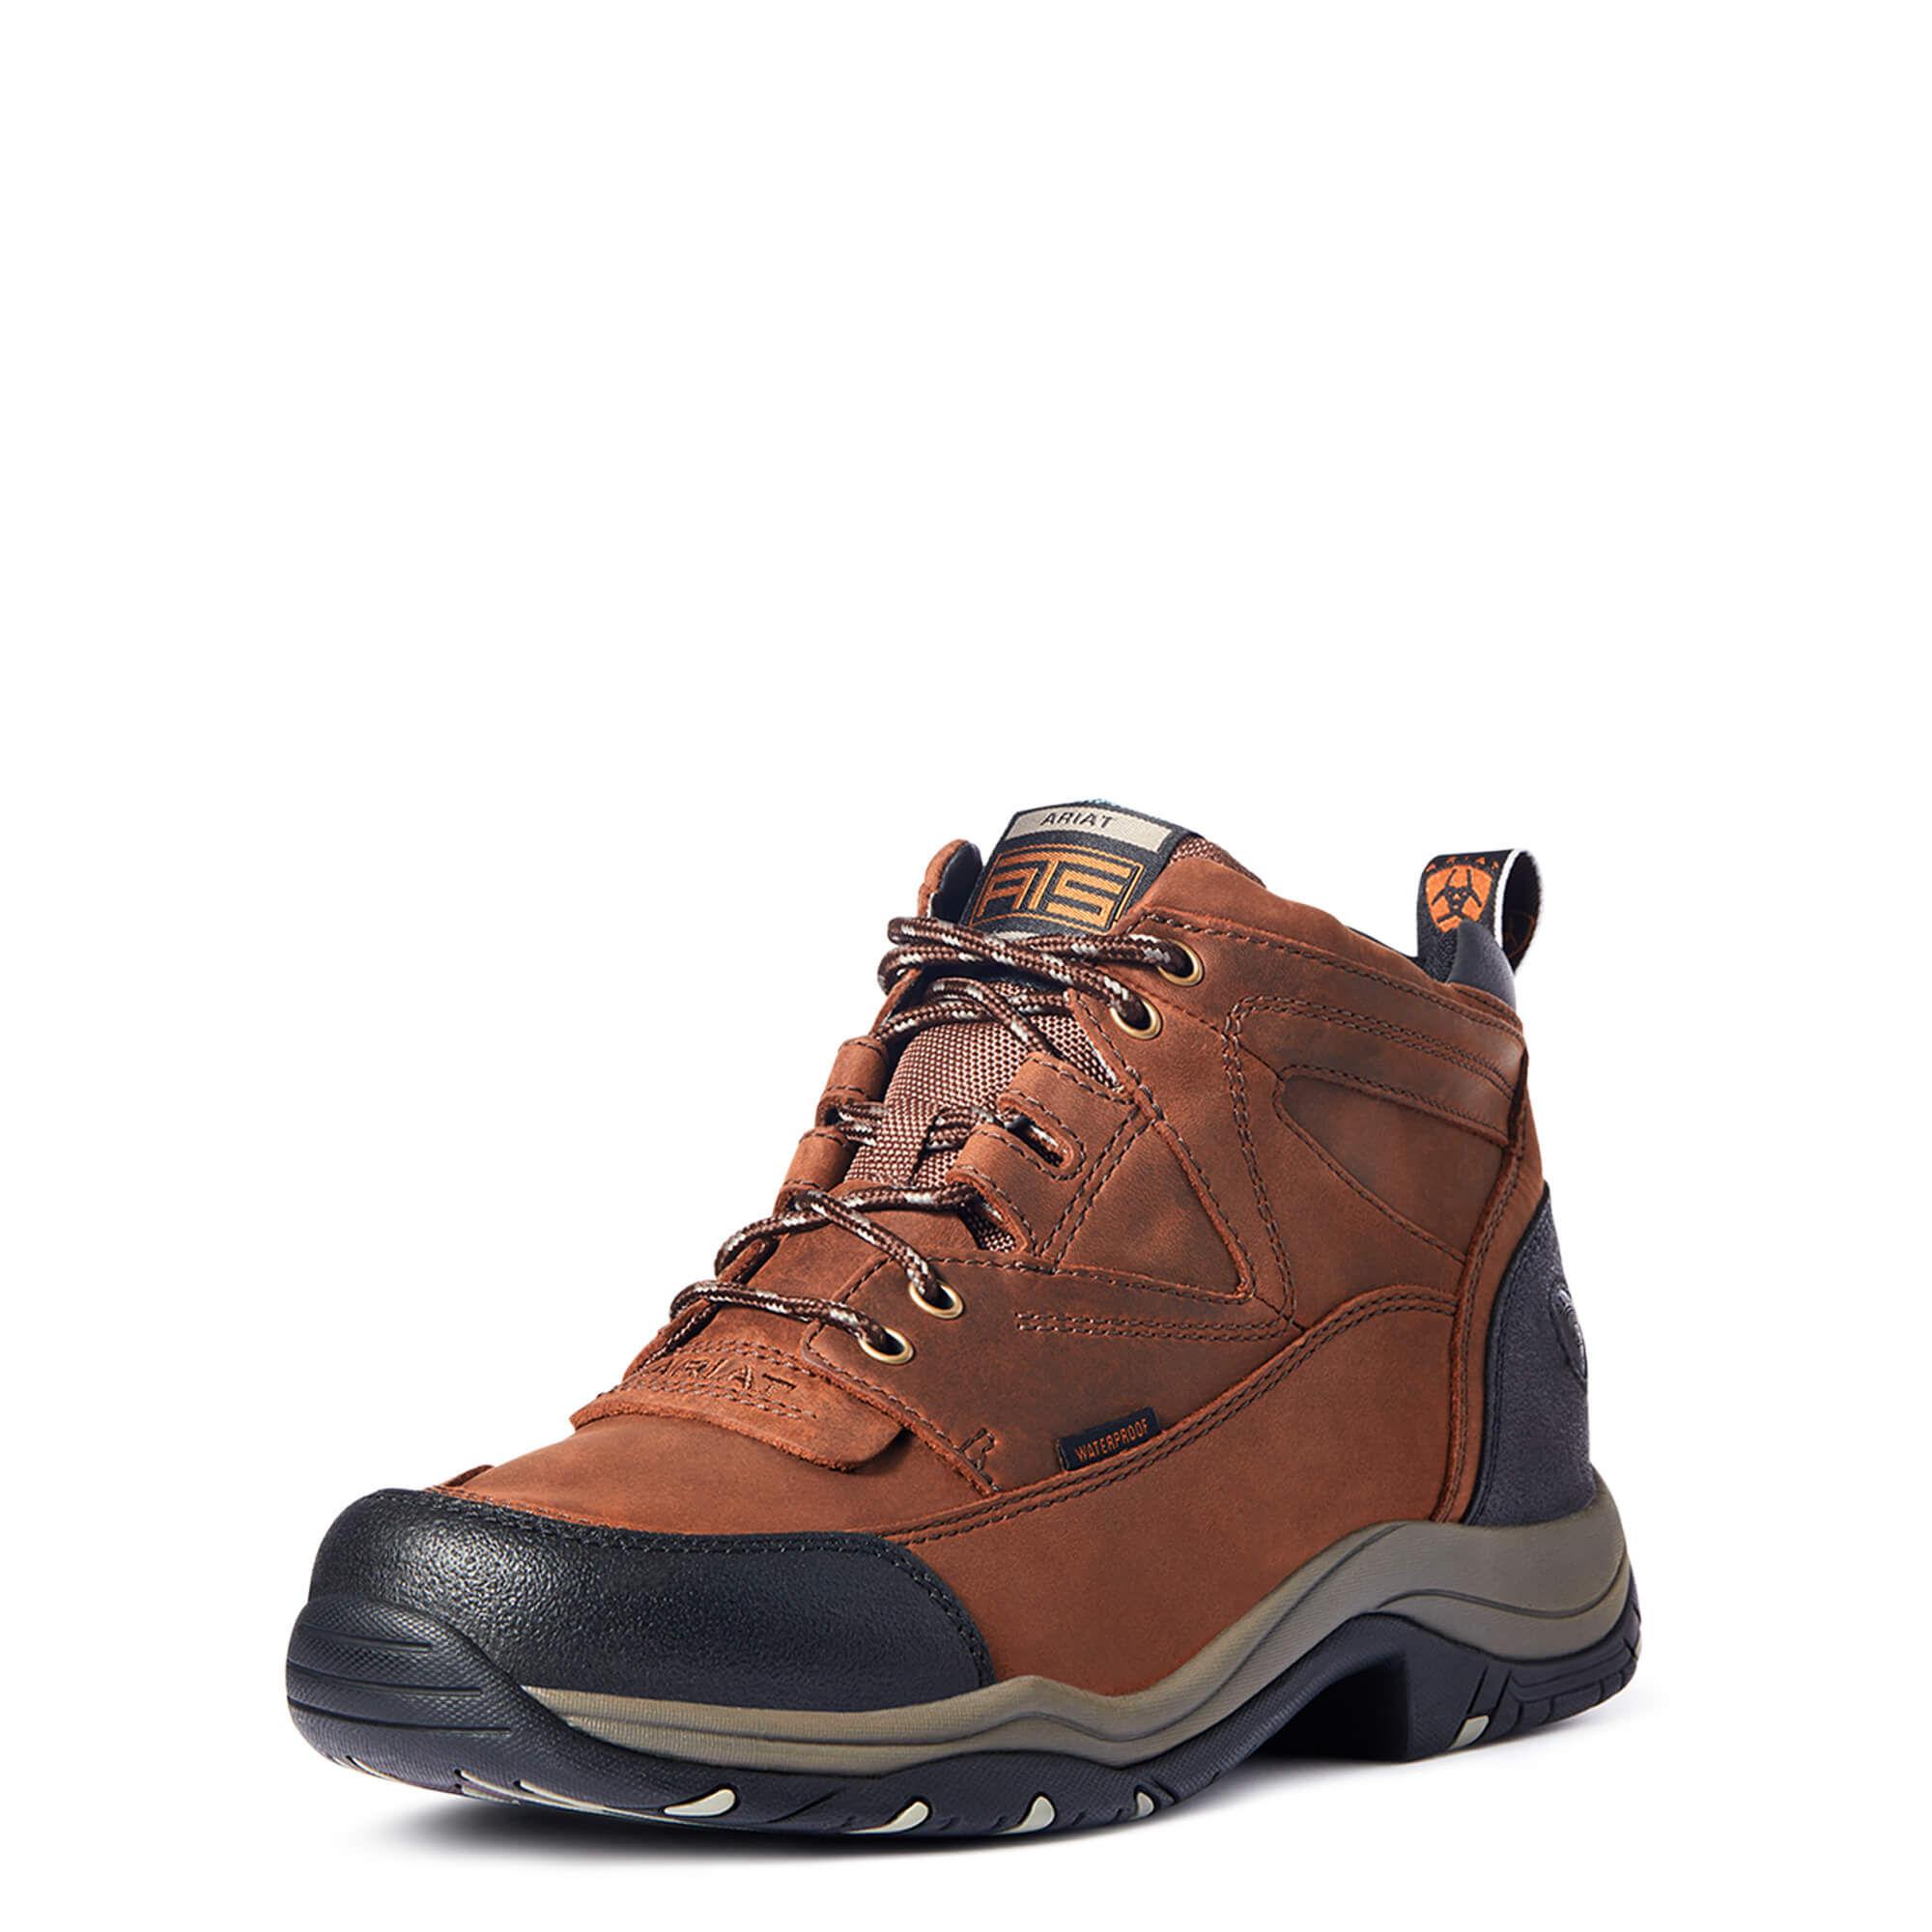 shoes men pdp best for footwear in pla floors p steel body keen view slip s m detroit concrete work on toe